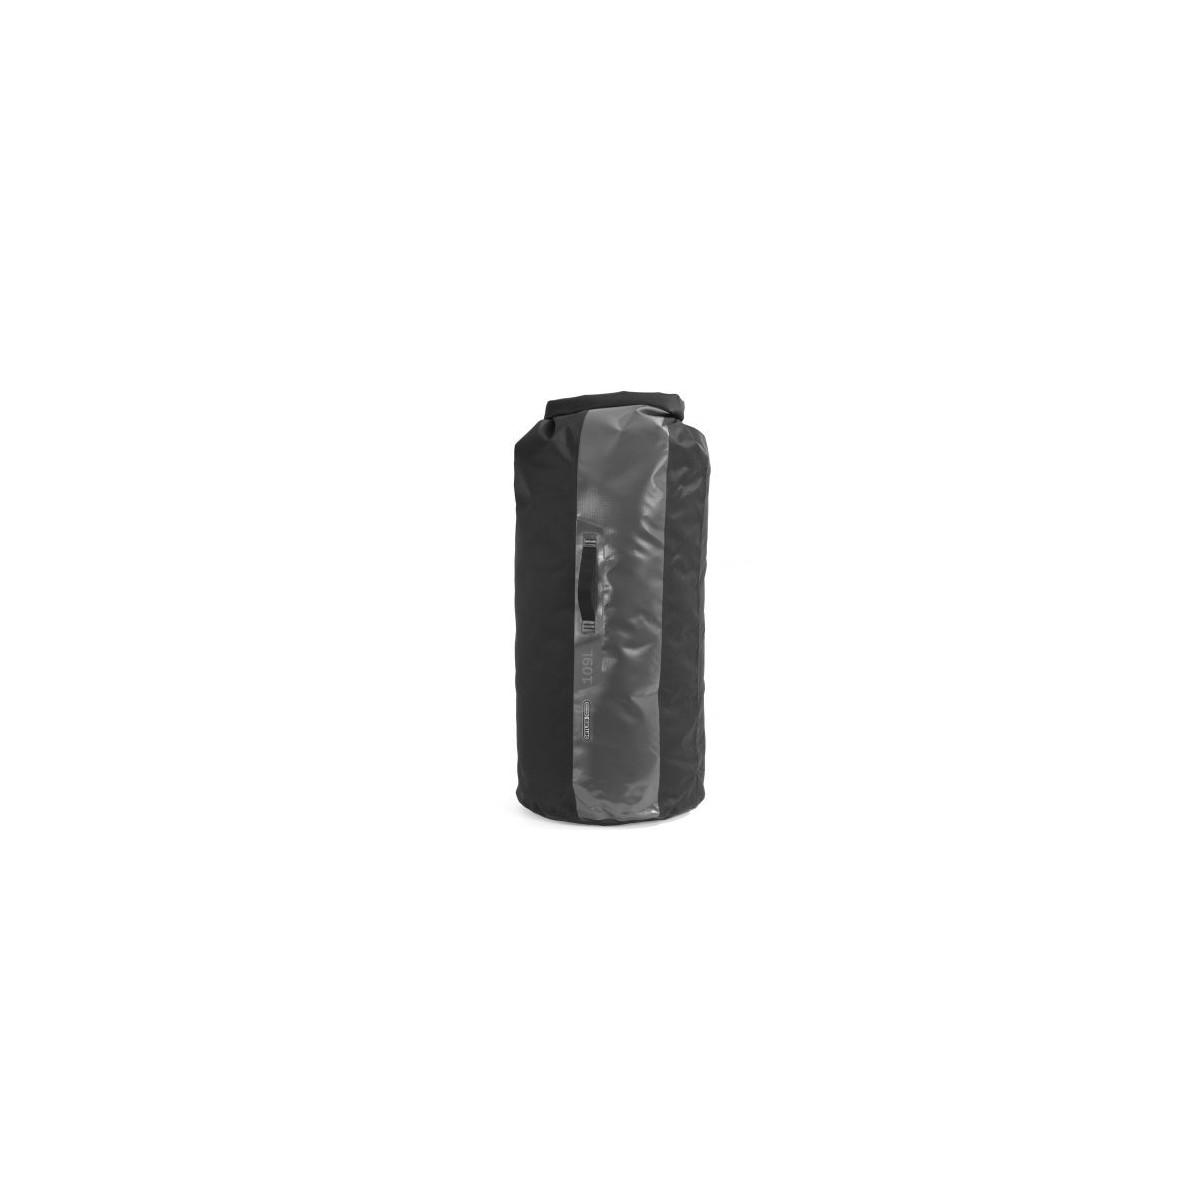 Ūdensdrošie maisi un iepakojumi Ortlieb PS 490 109 L